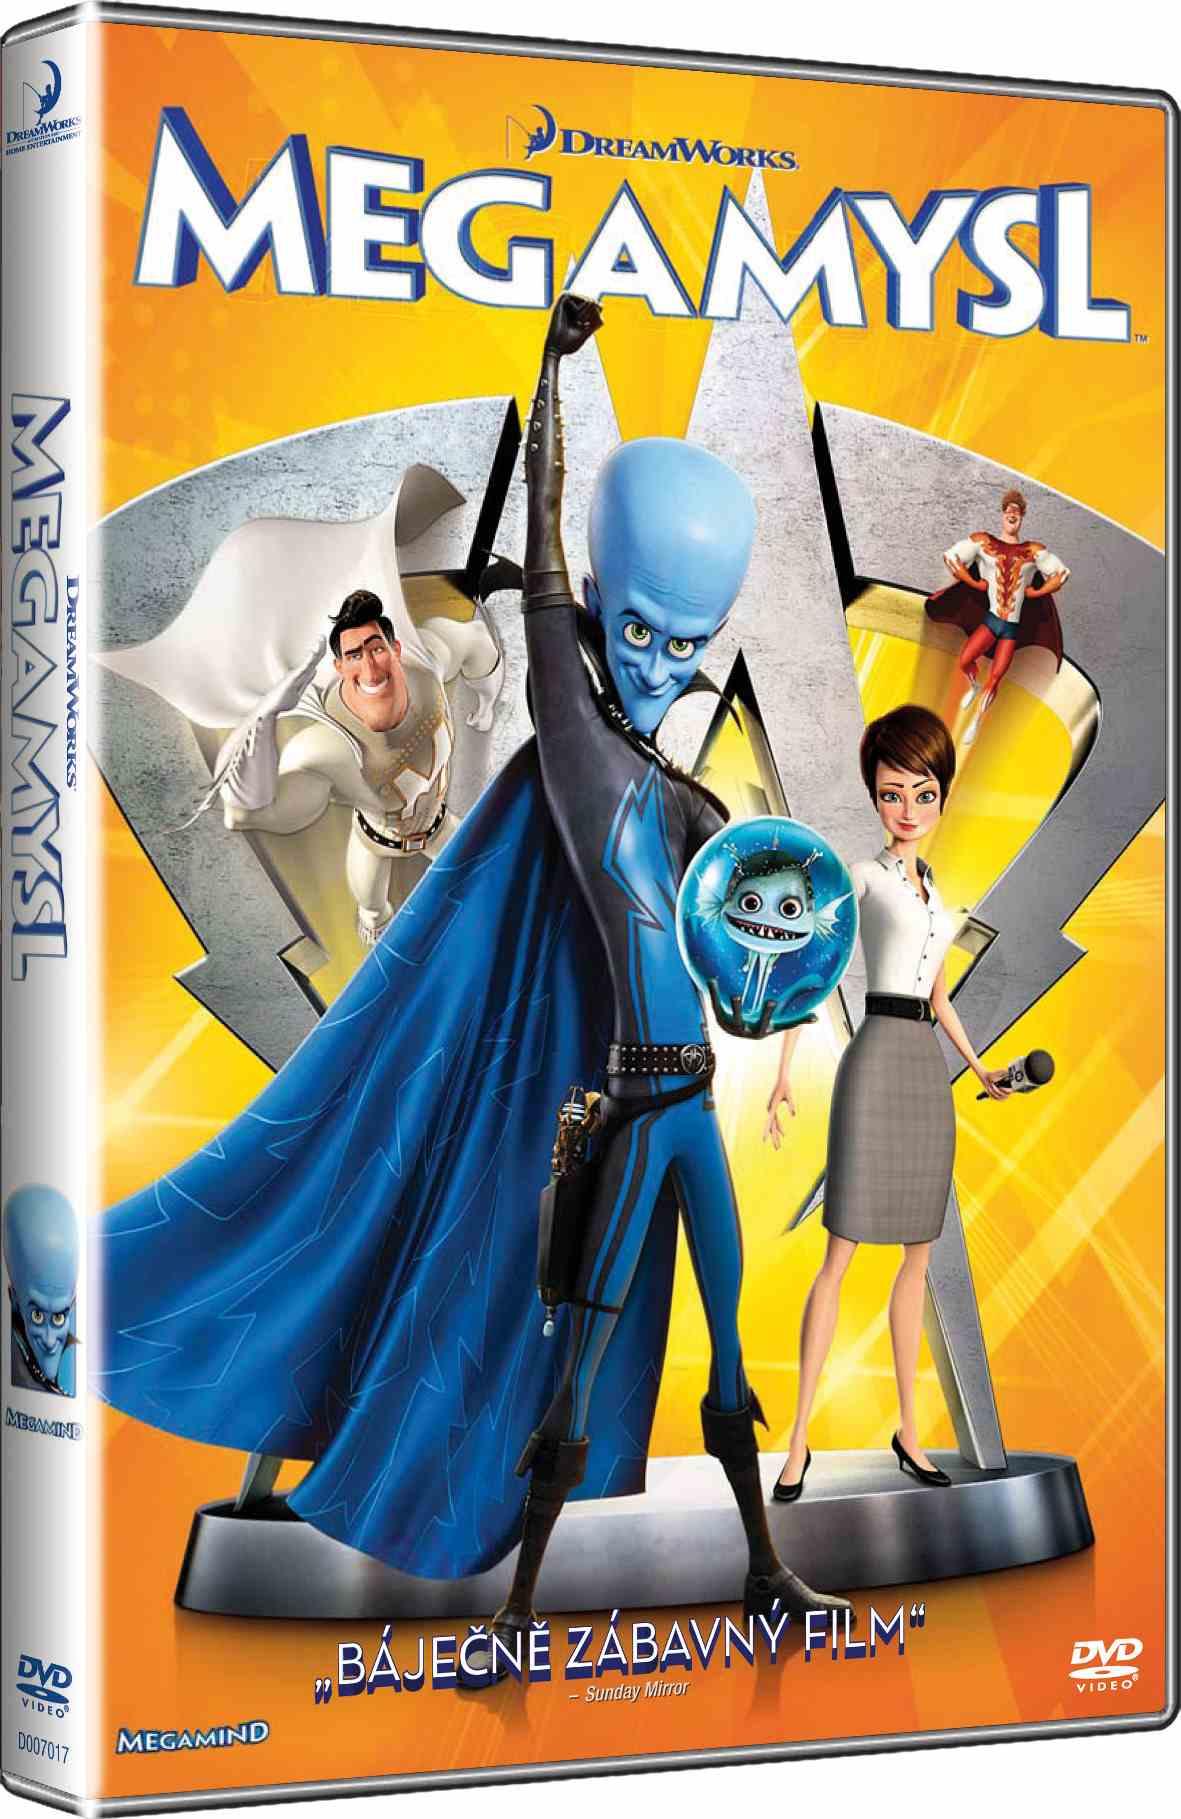 MEGAMYSL - DVD